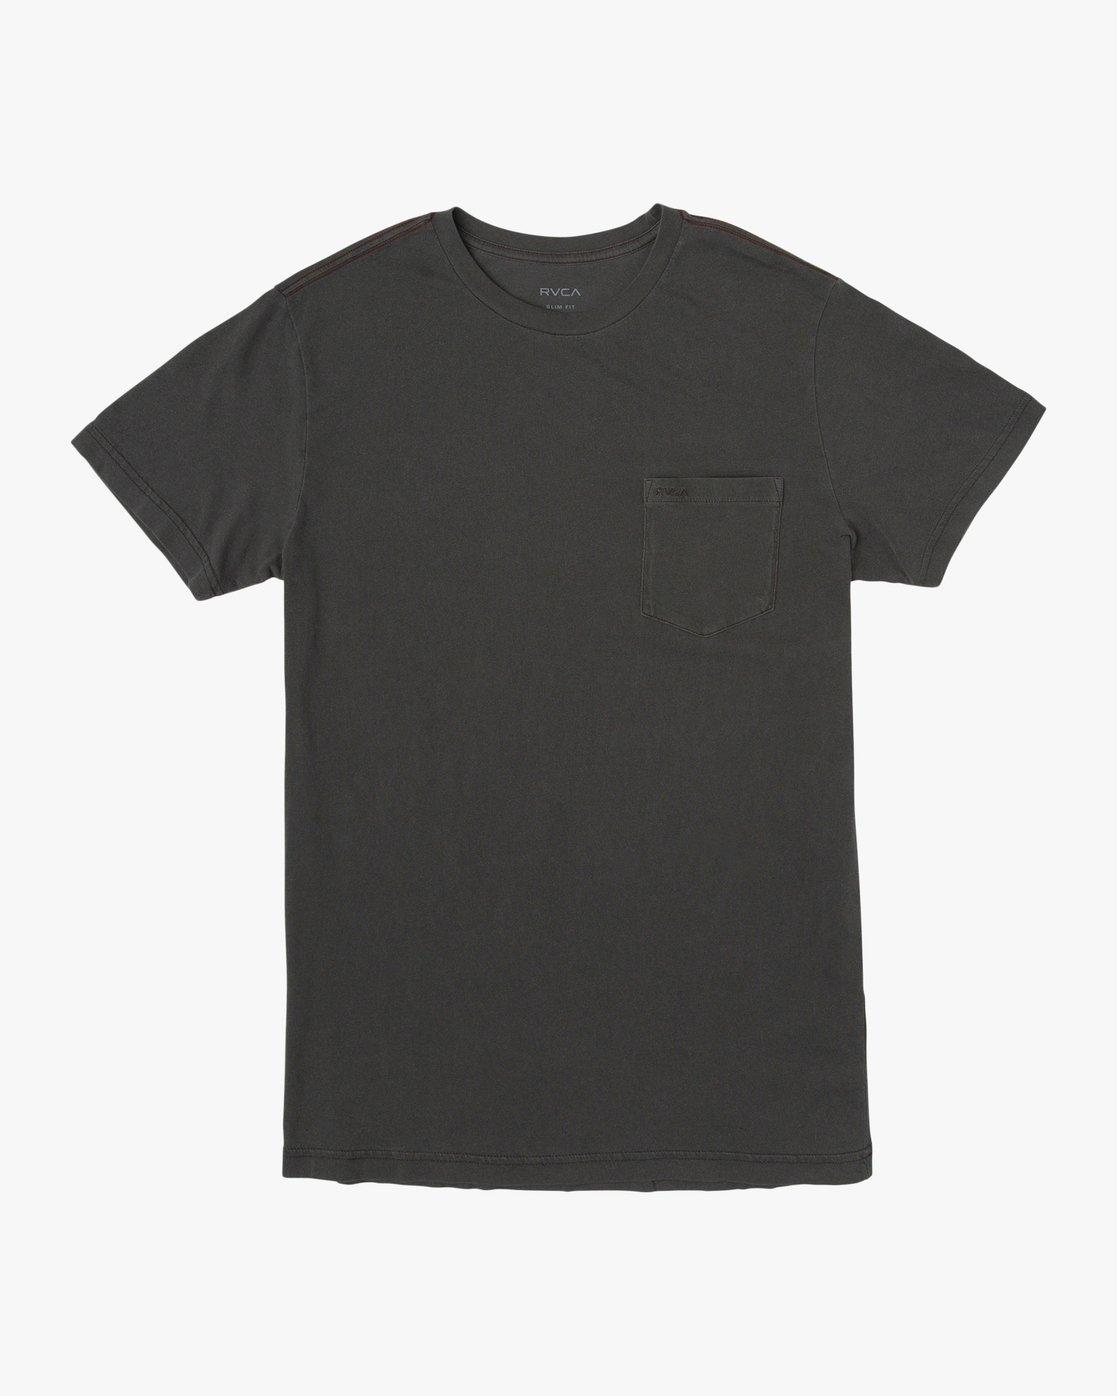 0 PTC 2 Pigment T-Shirt Black M437TRPT RVCA